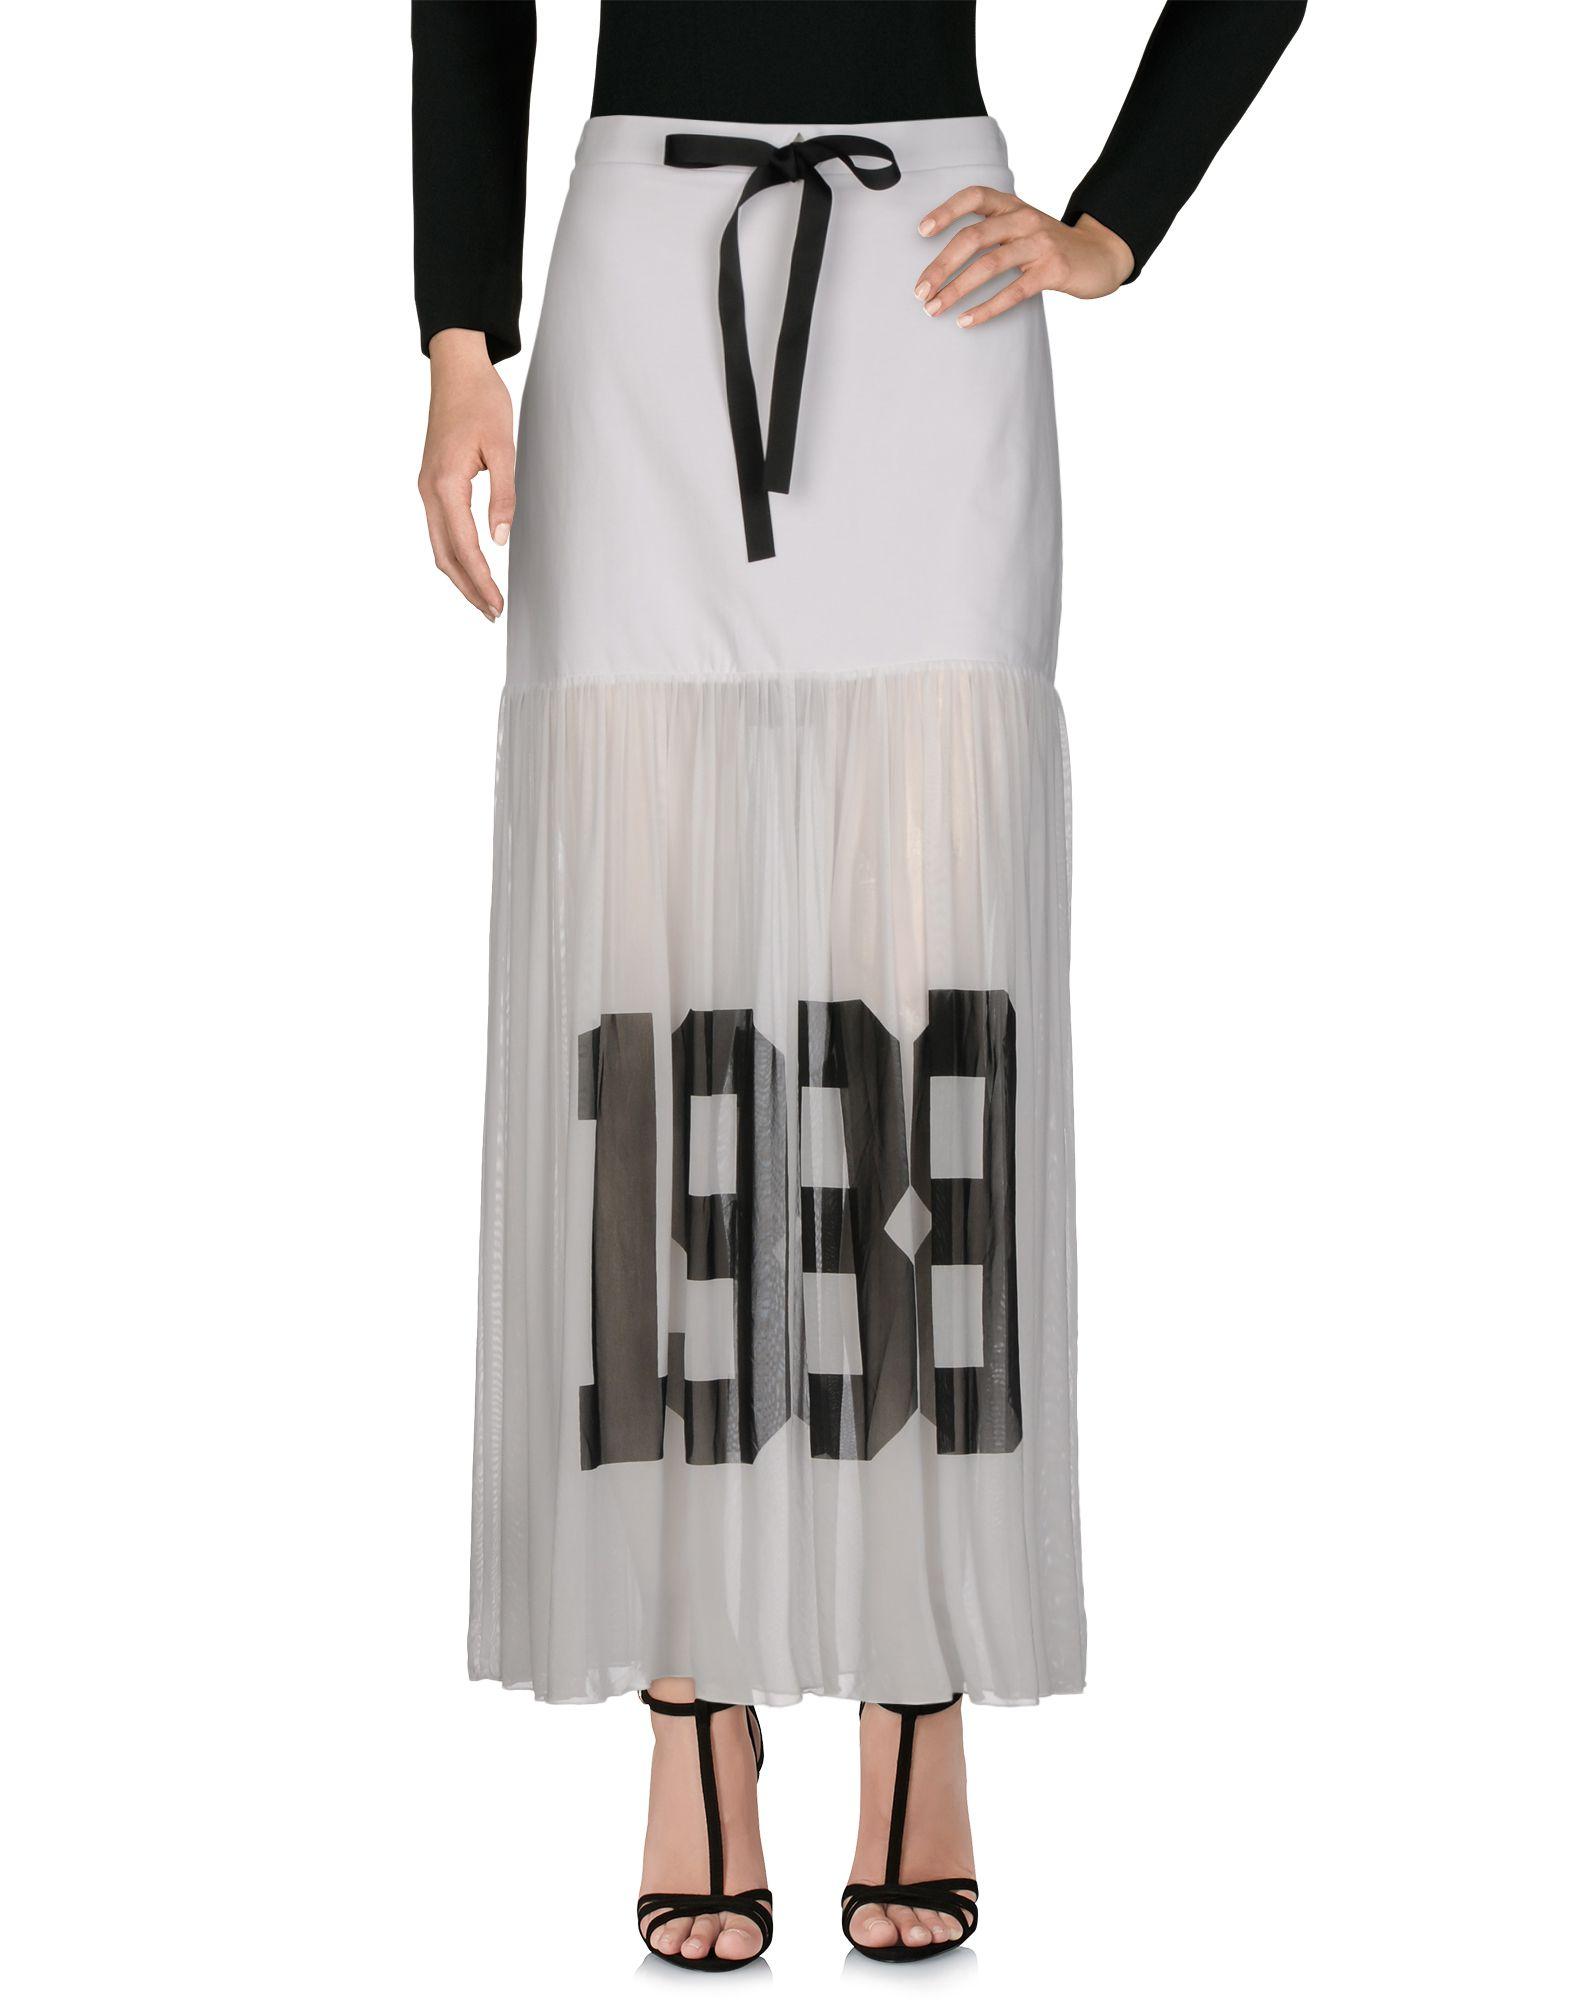 Фото - TWINSET Длинная юбка 12storeez юбка миди со складками спереди